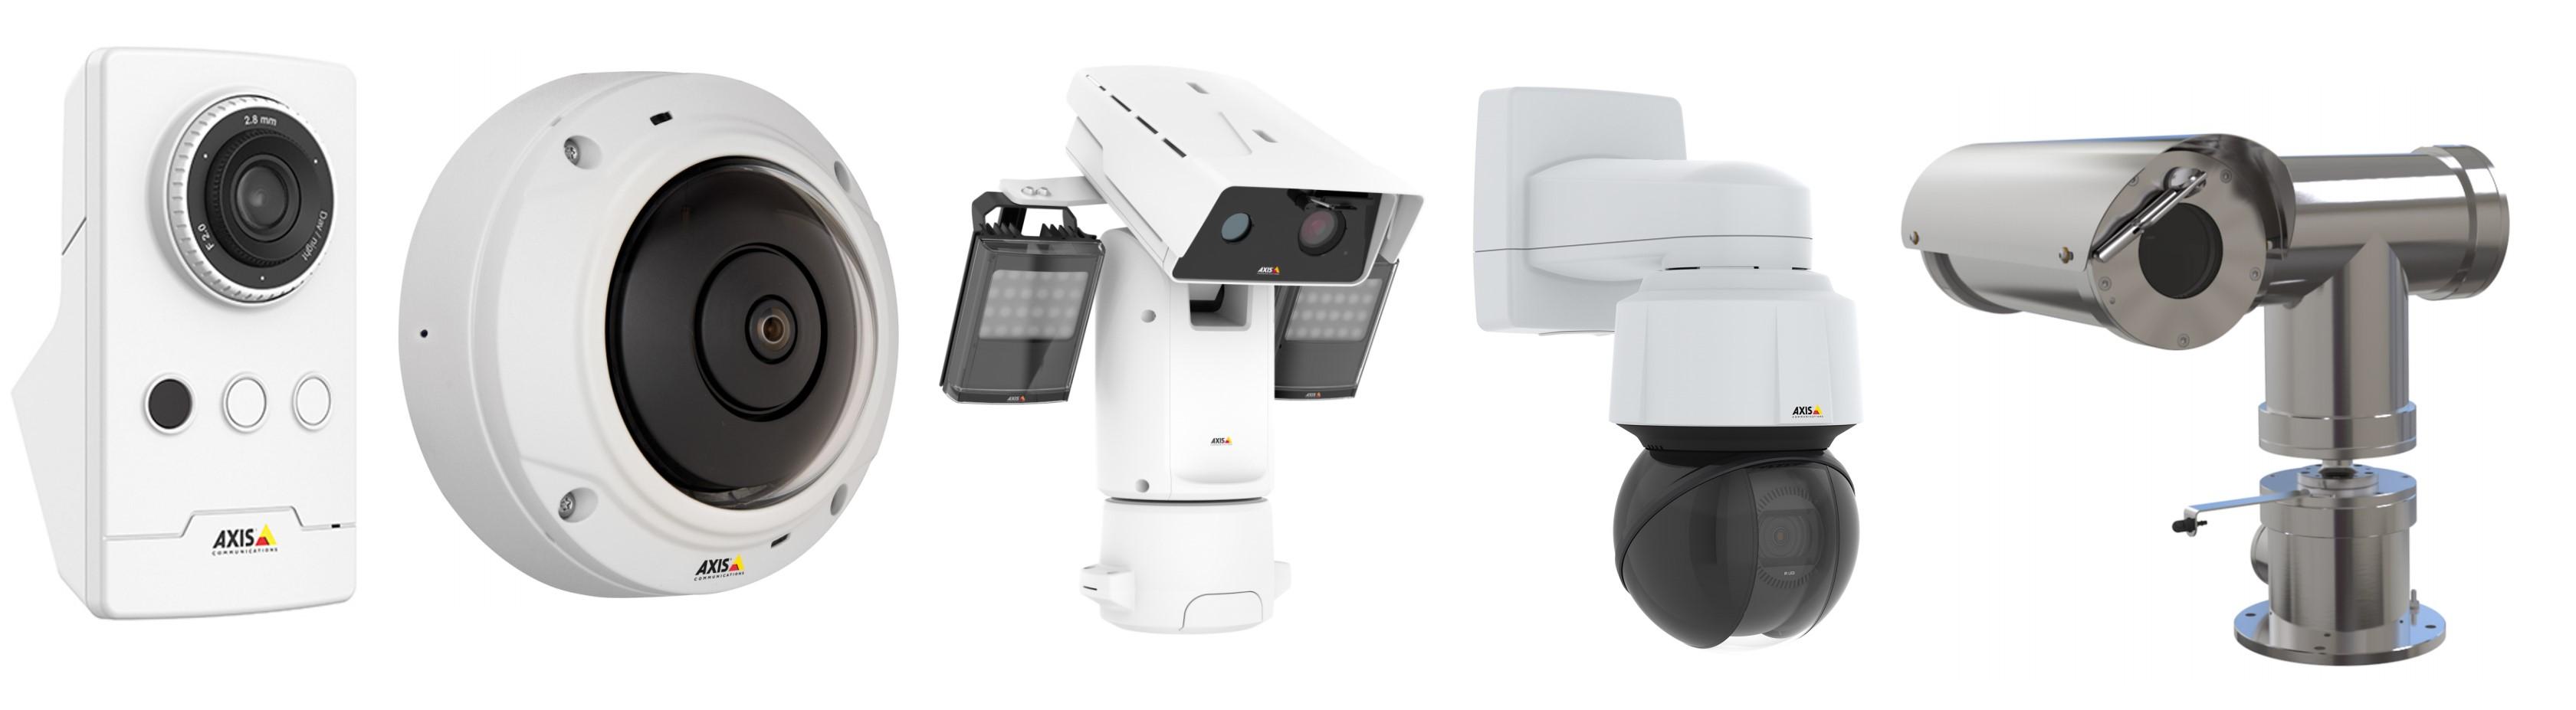 Типы IP-камер Axis